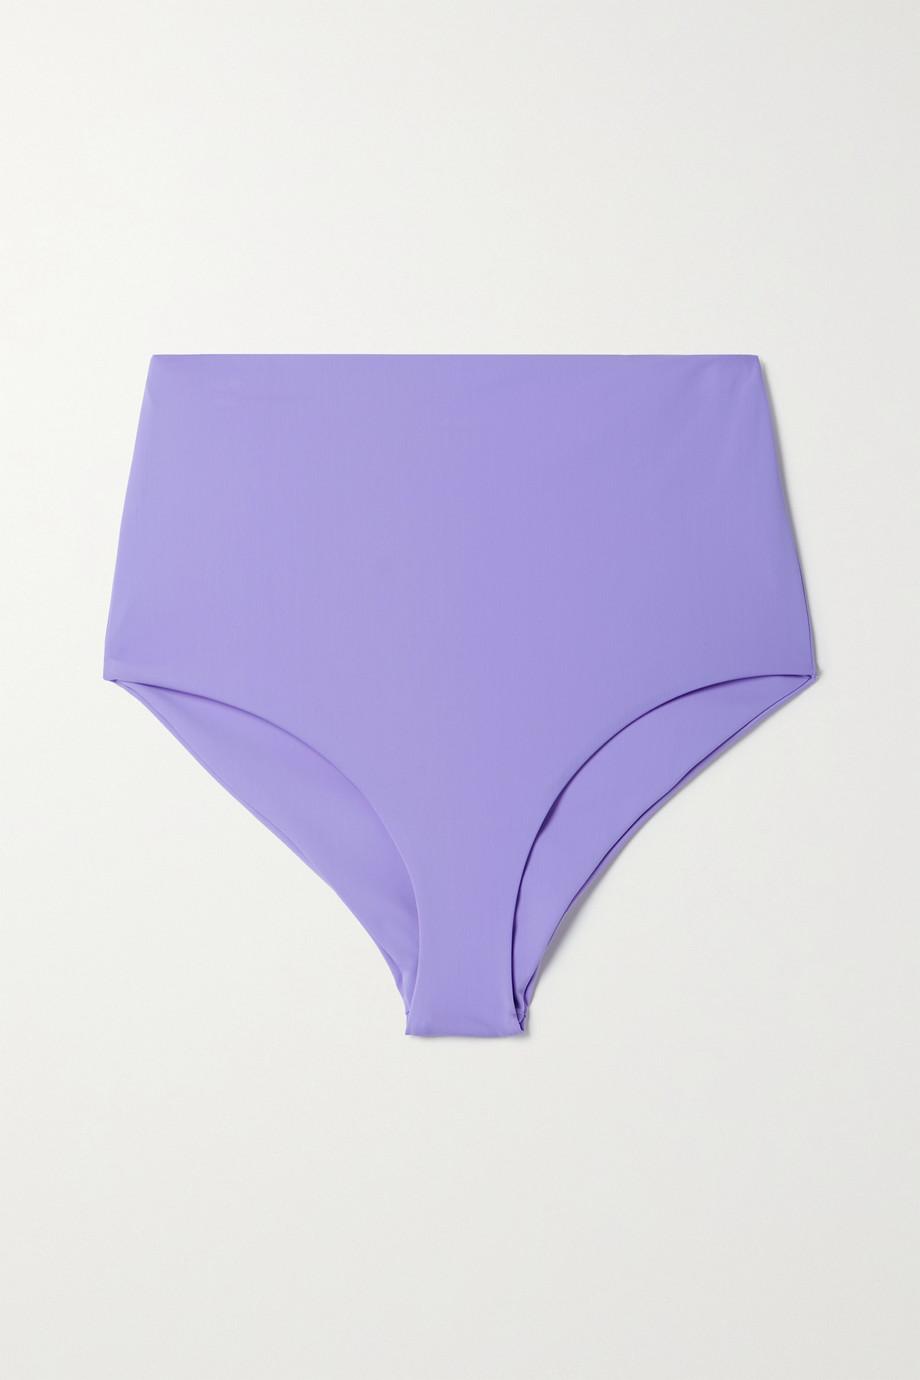 Mara Hoffman + NET SUSTAIN Lydia bikini briefs